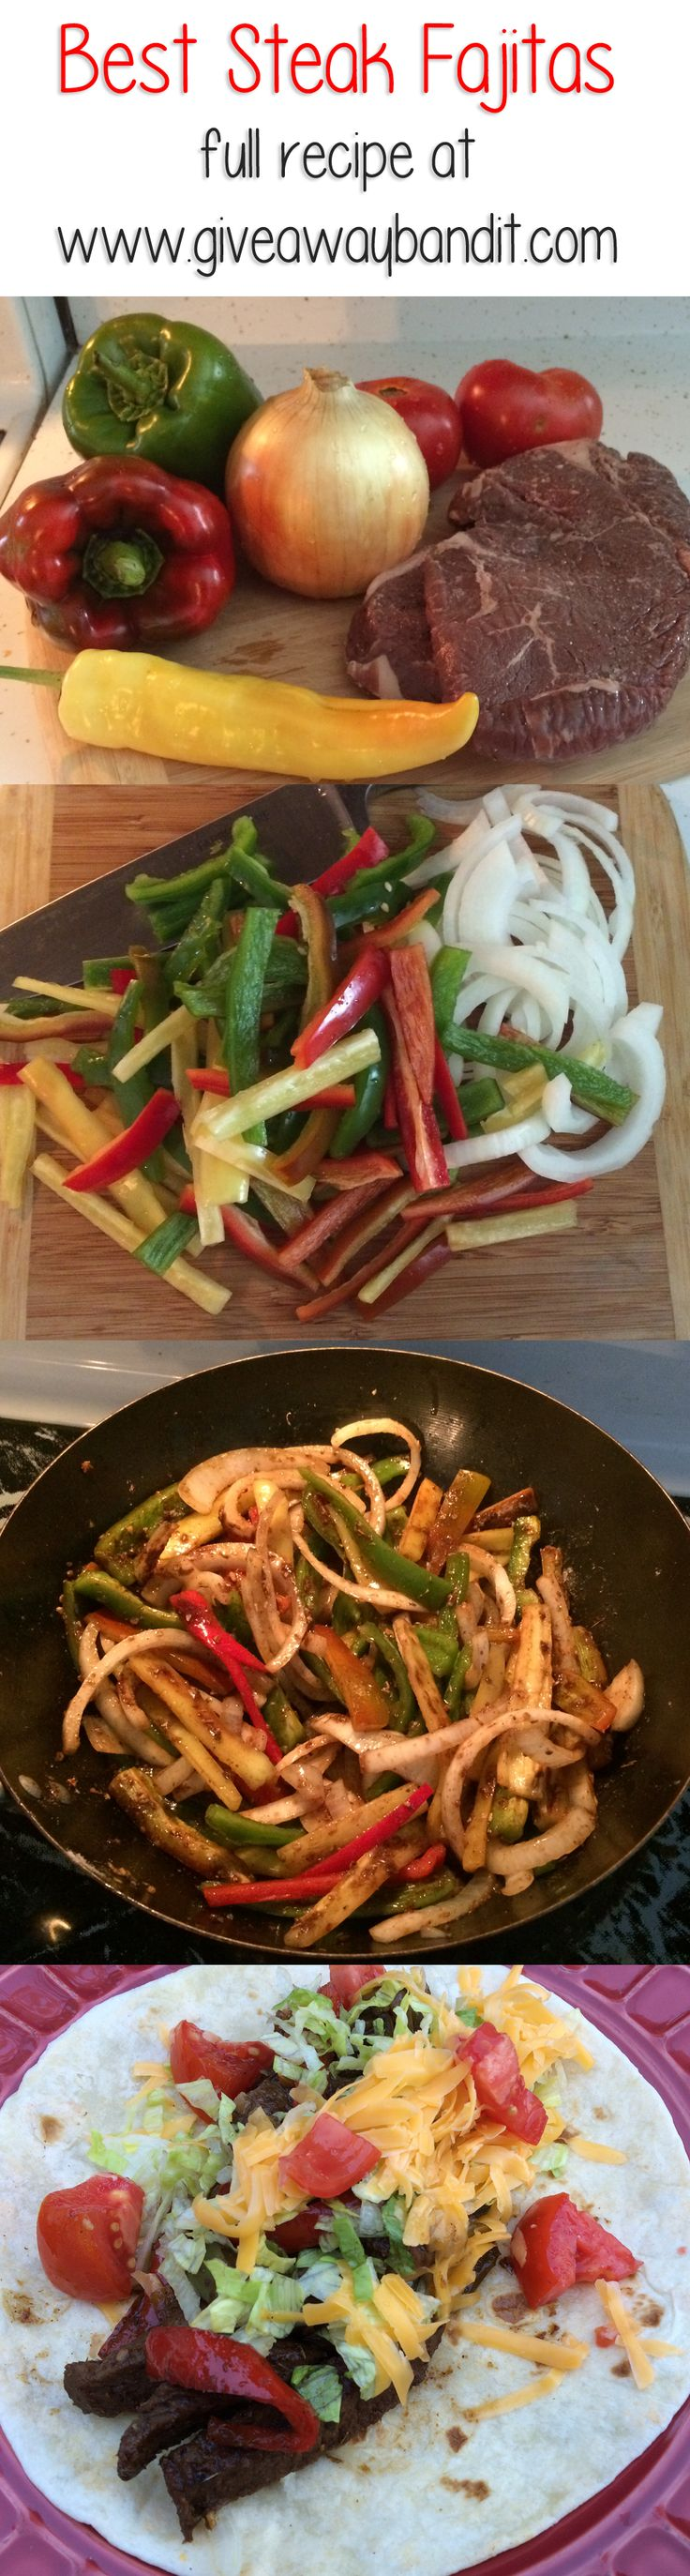 Best Easy Steak Fajita Recipe #recipe